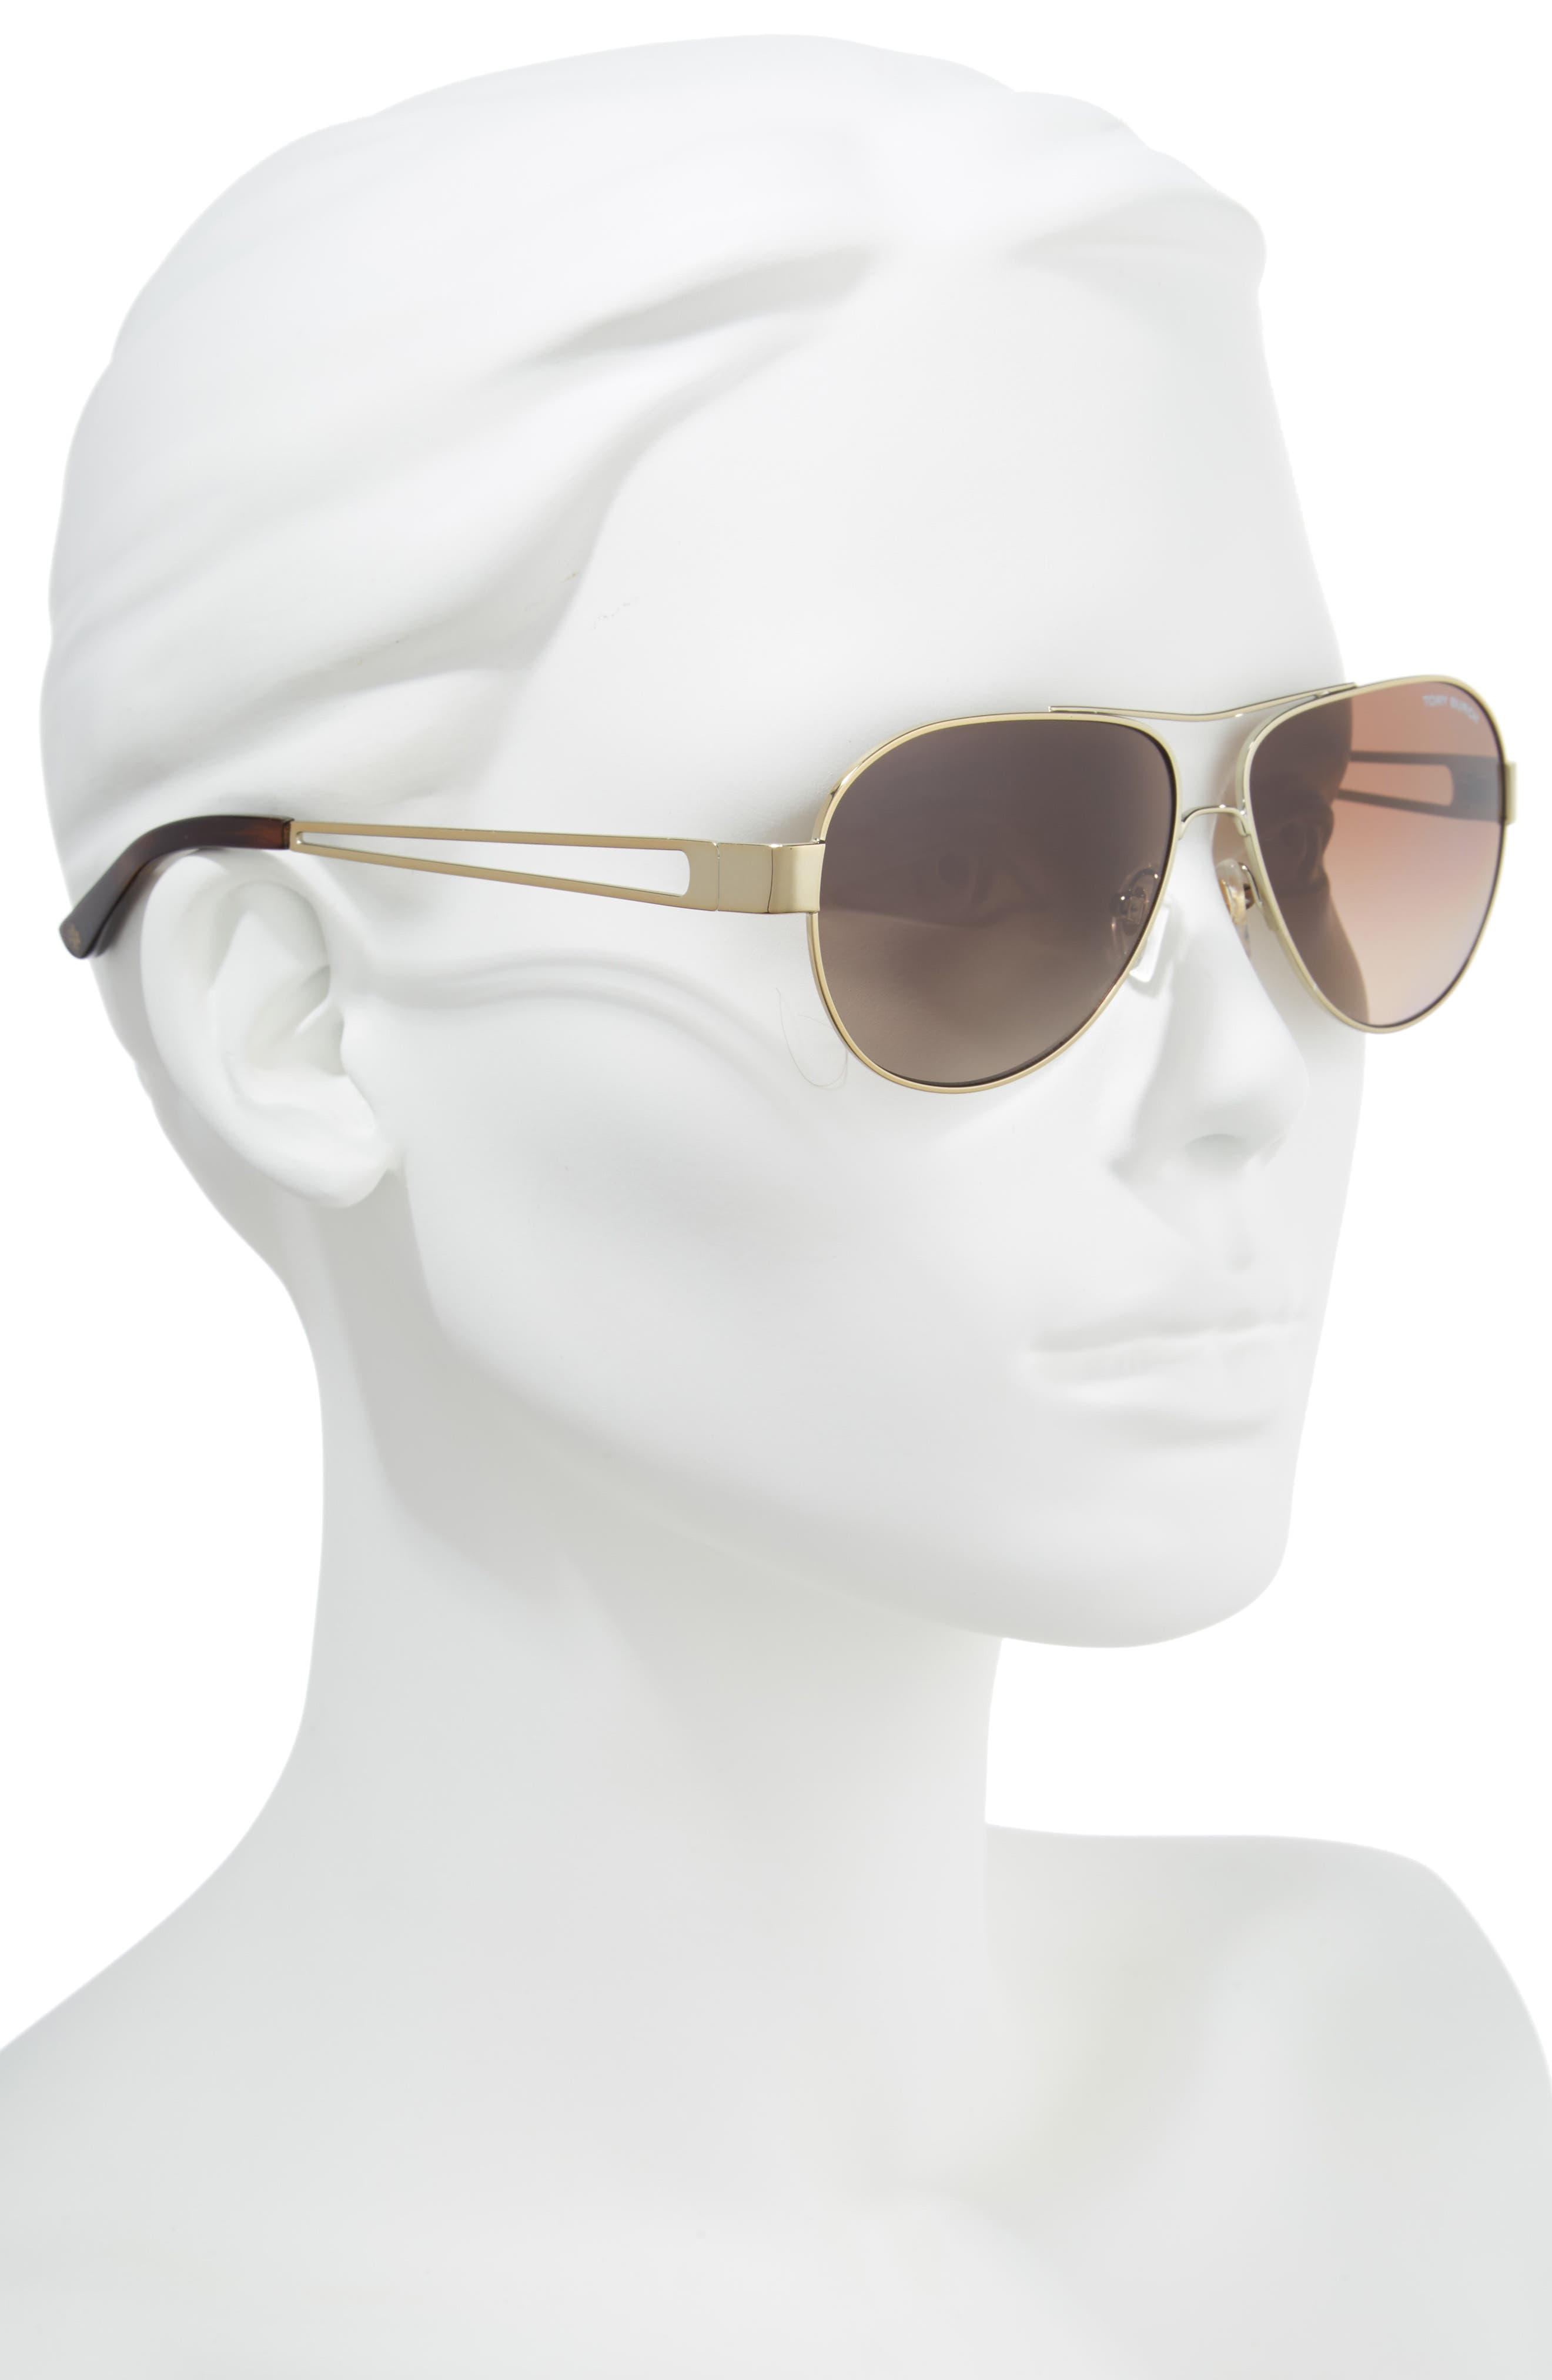 bb8fb7a56d Tory Burch Sunglasses